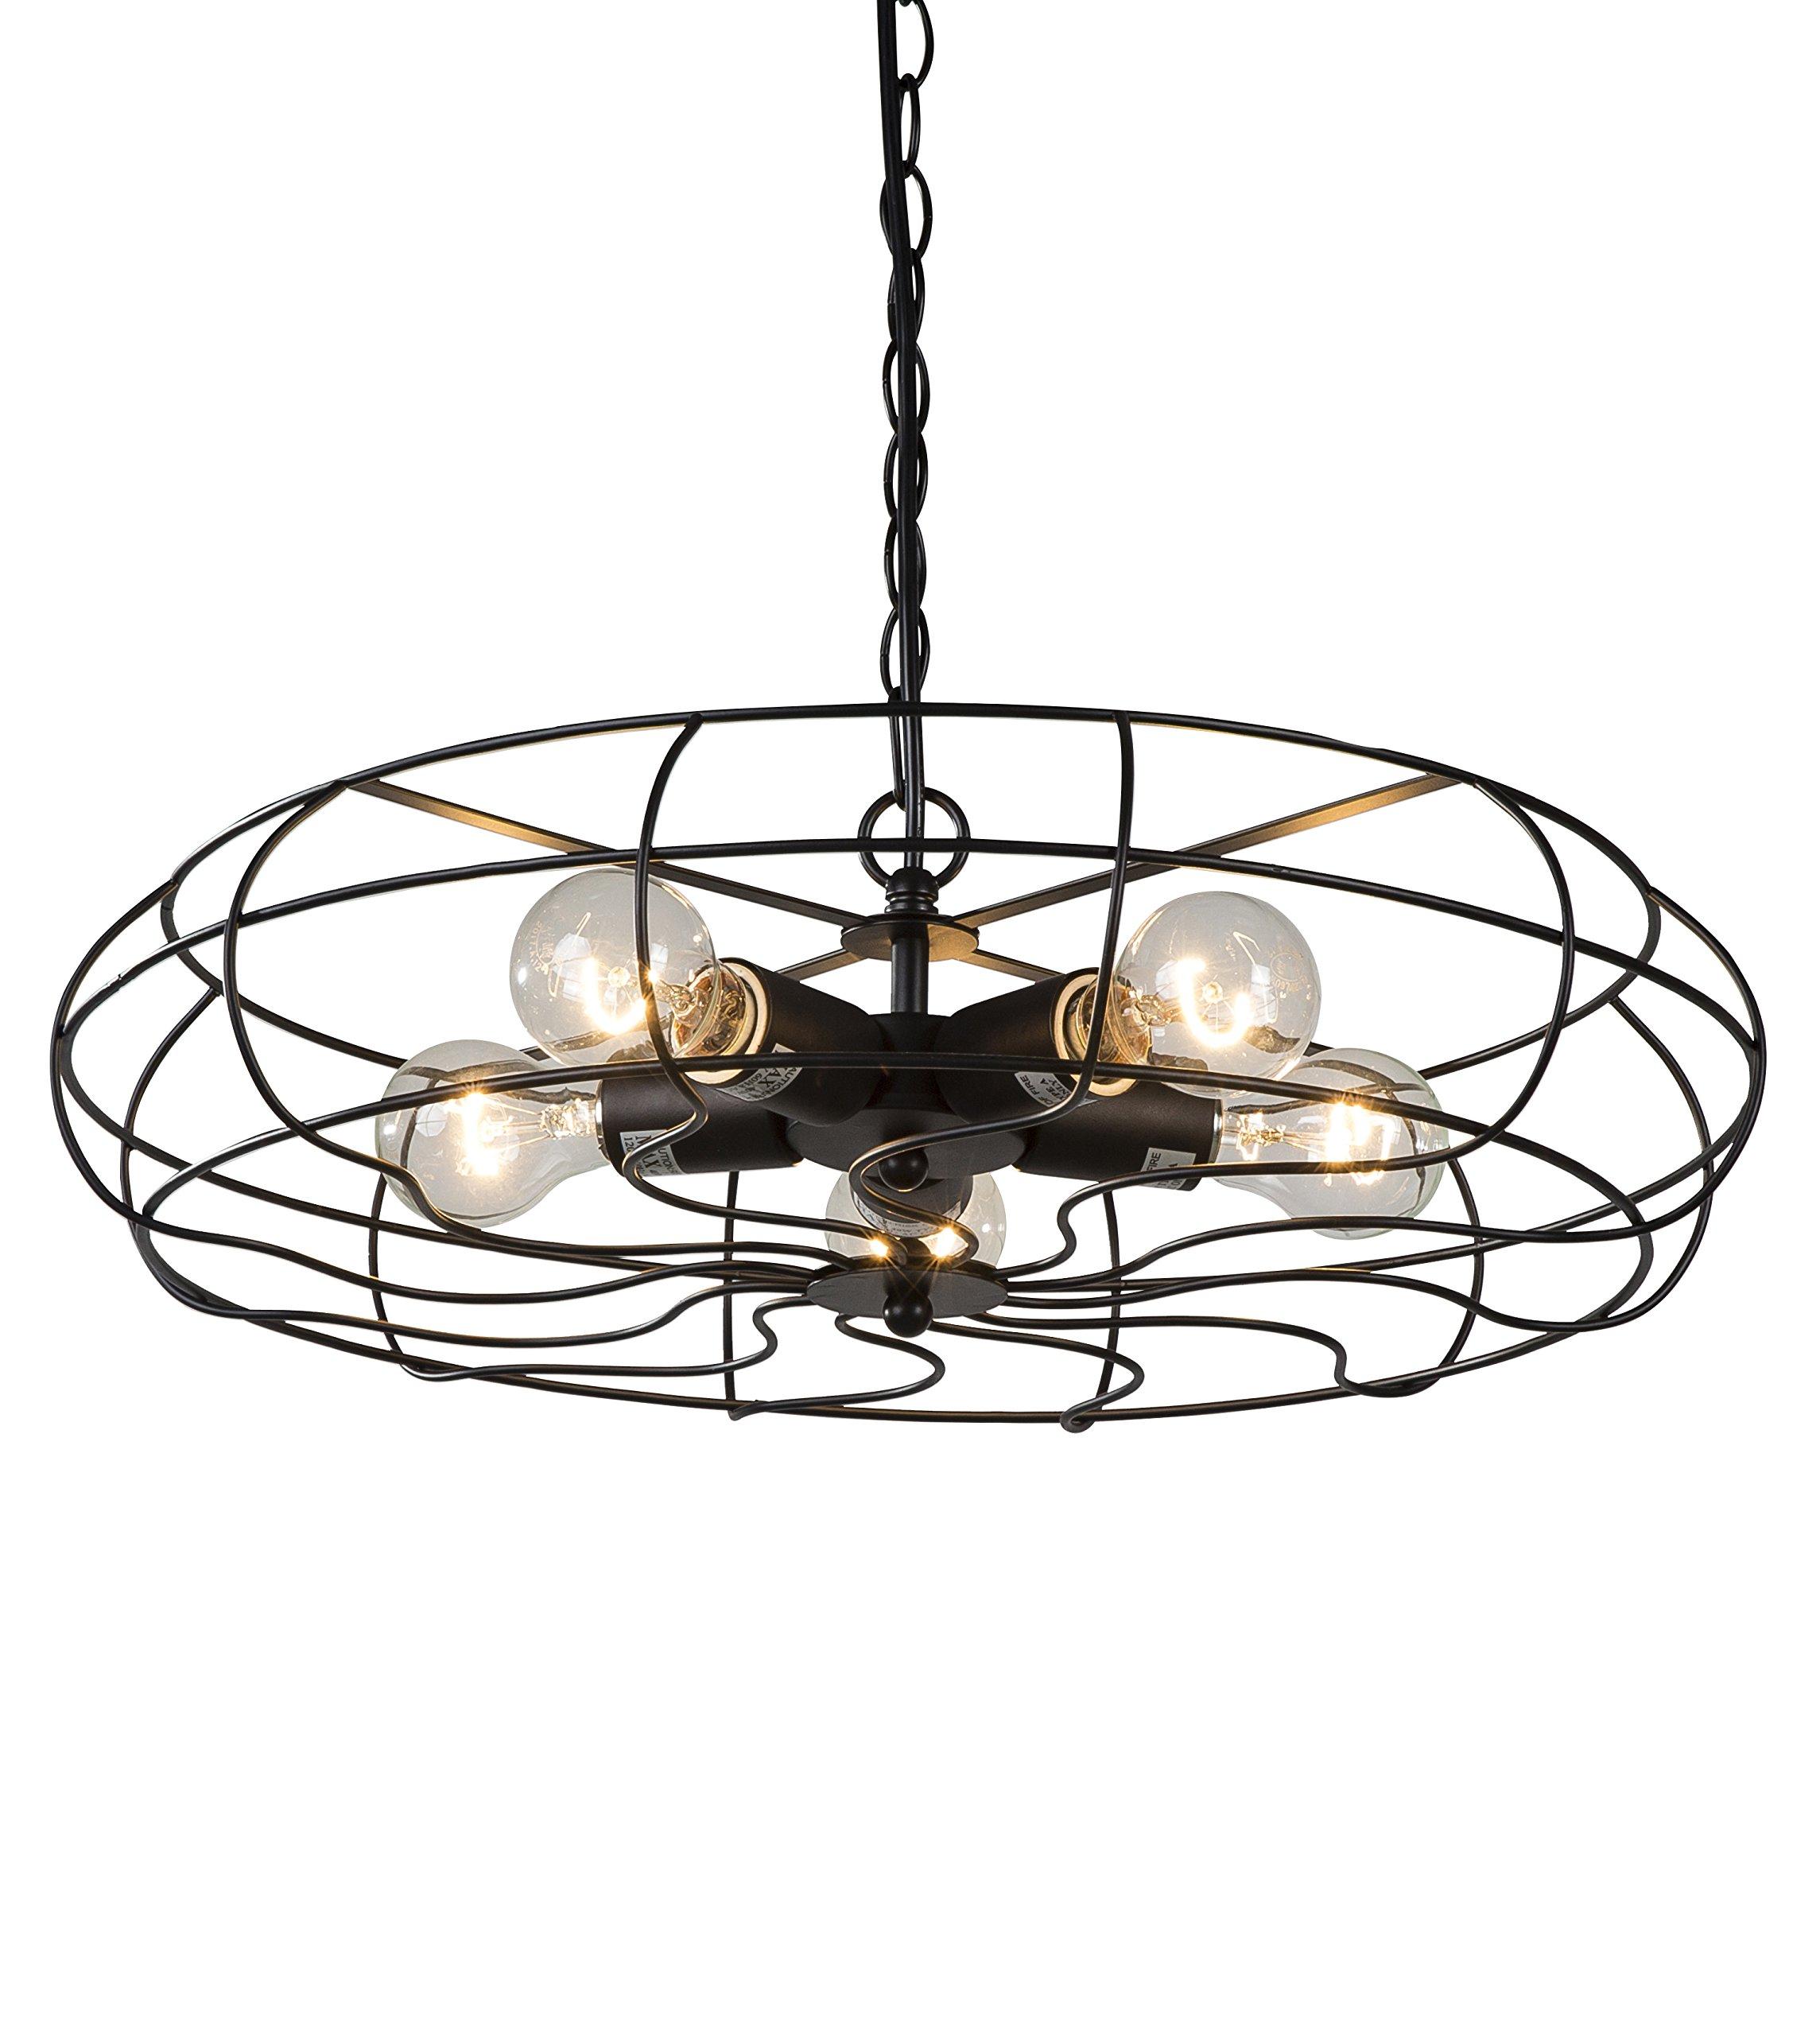 BTExpert 5077 Vintage Matte Finish Industrial Chandelier 5 Lights Fan Style Cage Metal Home Gage 20'' Hanging Pendant, Black